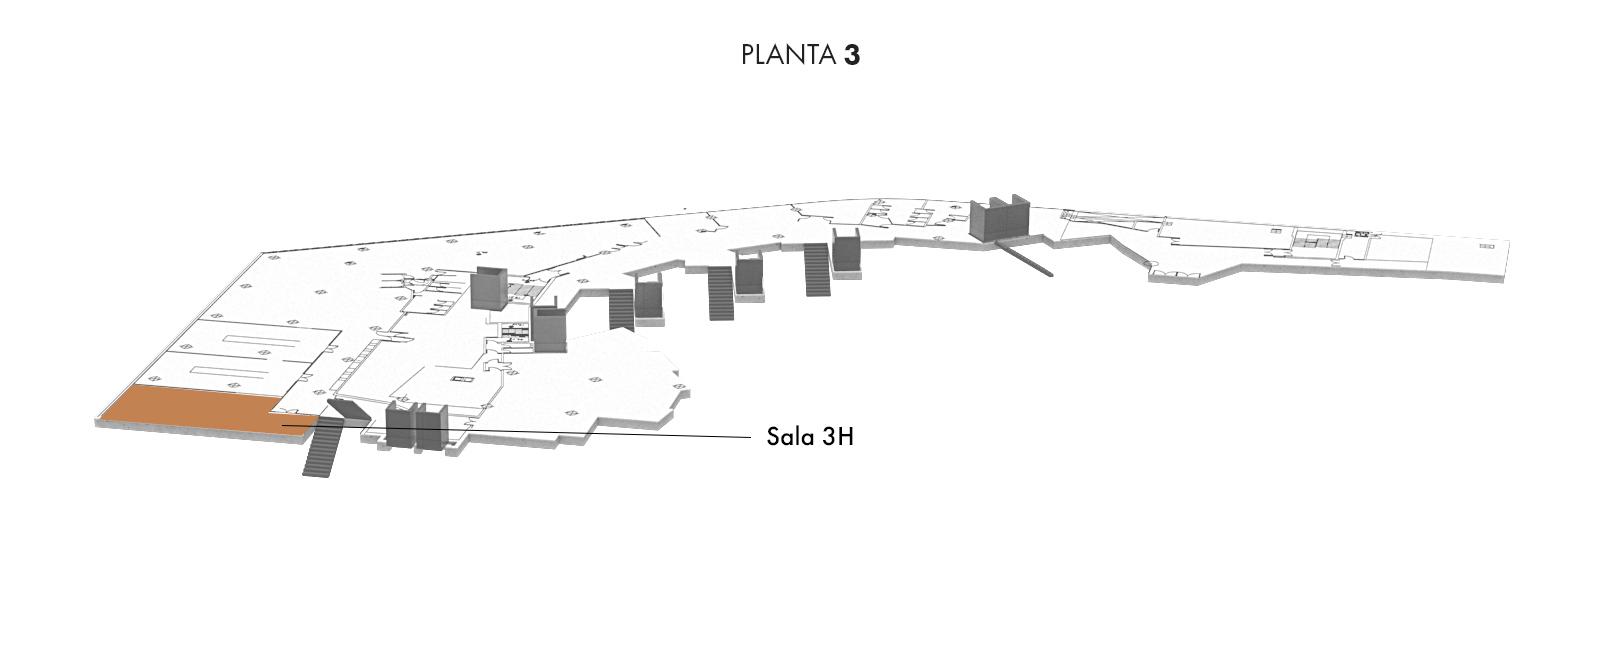 Sala 3H, Planta 3 | Palacio Euskalduna Jauregia